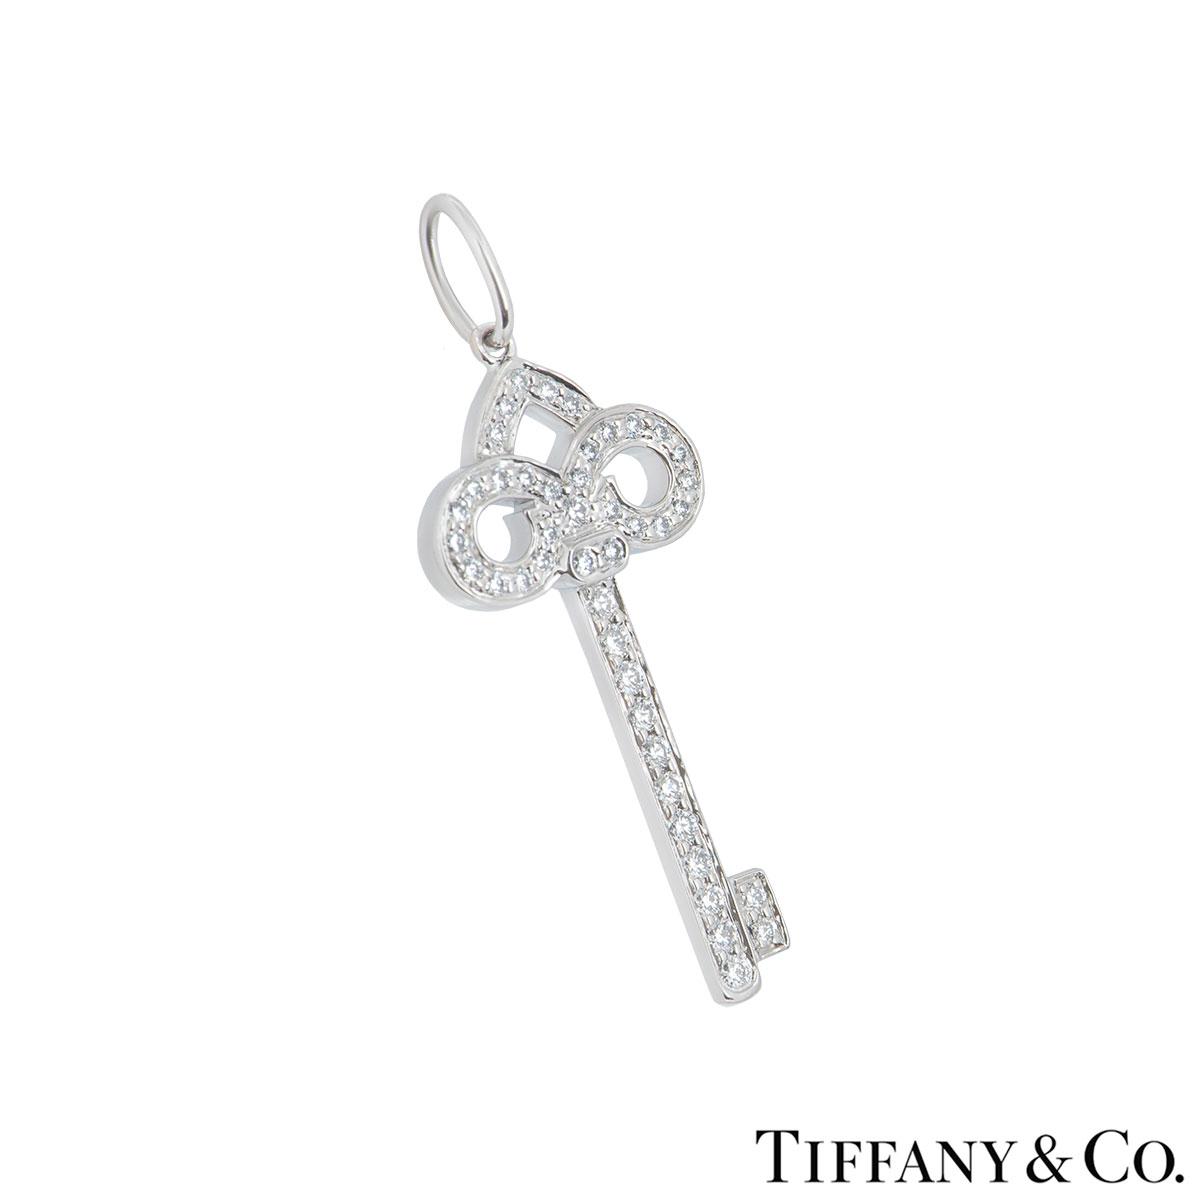 Tiffany & Co. Platinum Diamond Fleur De Lis Key Pendant